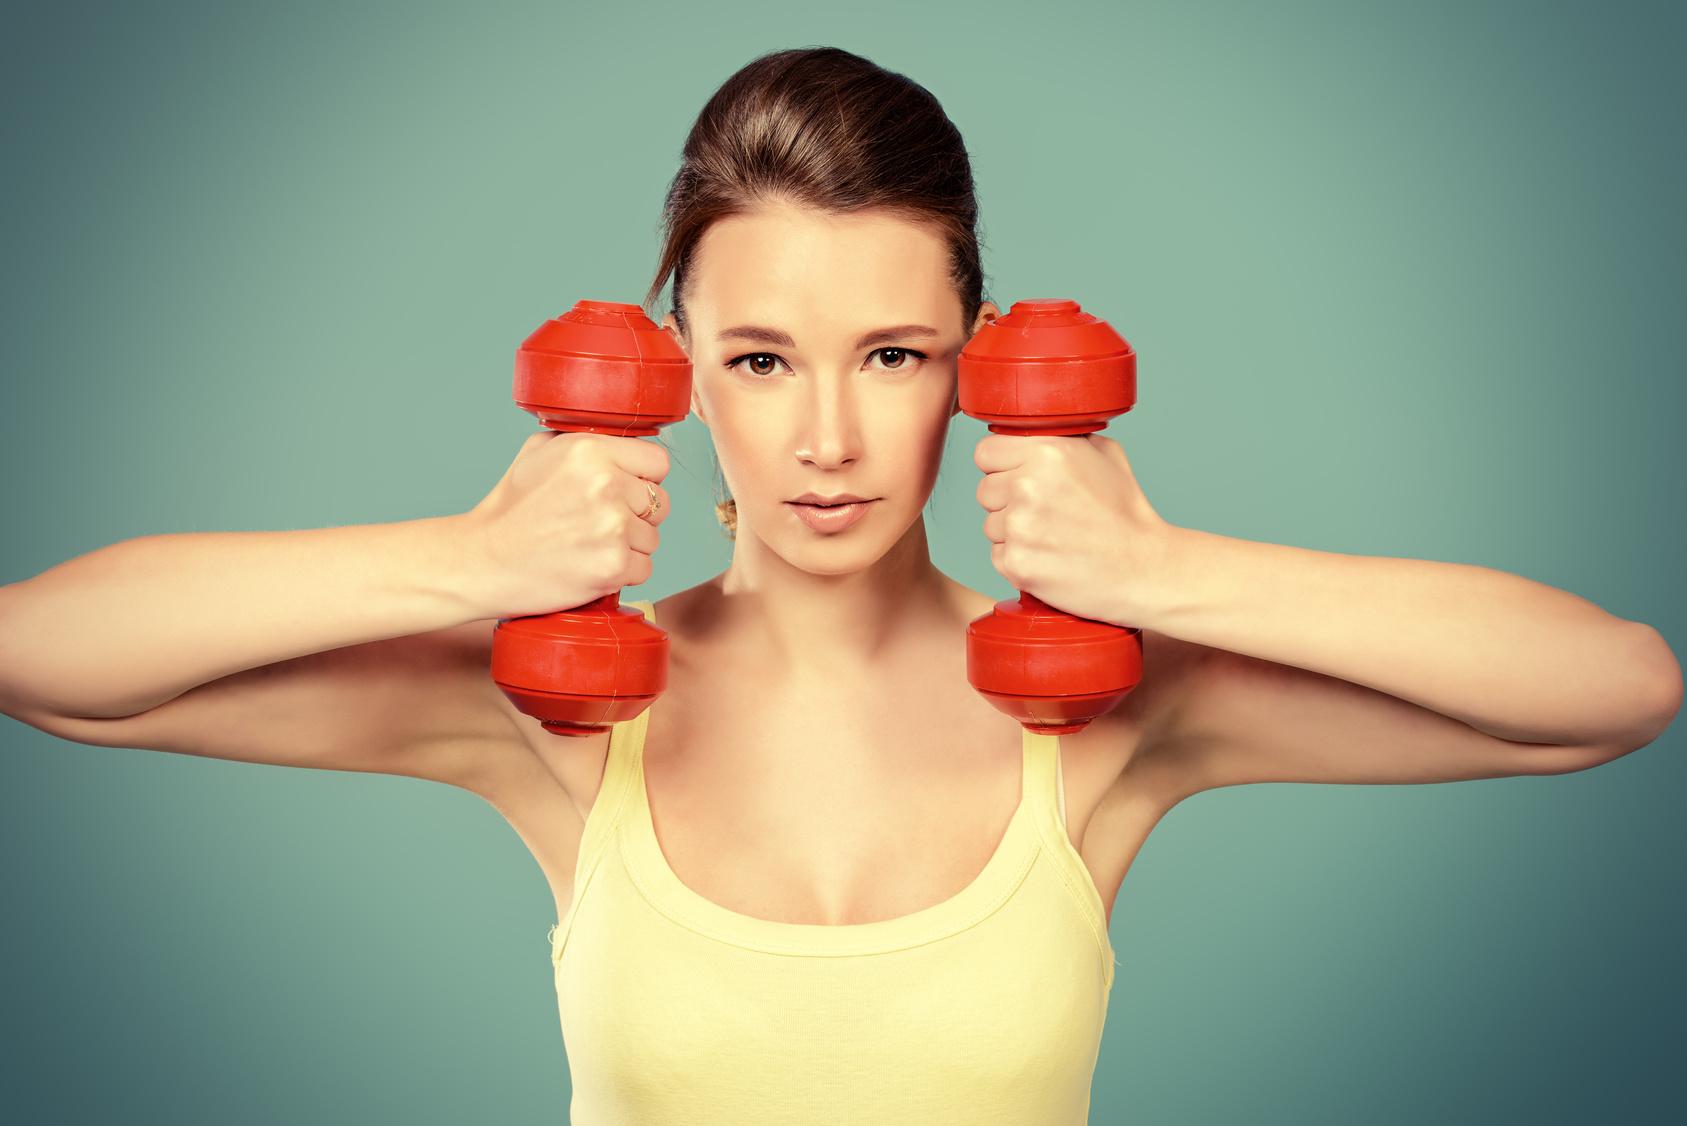 BodyChange Arm Workout